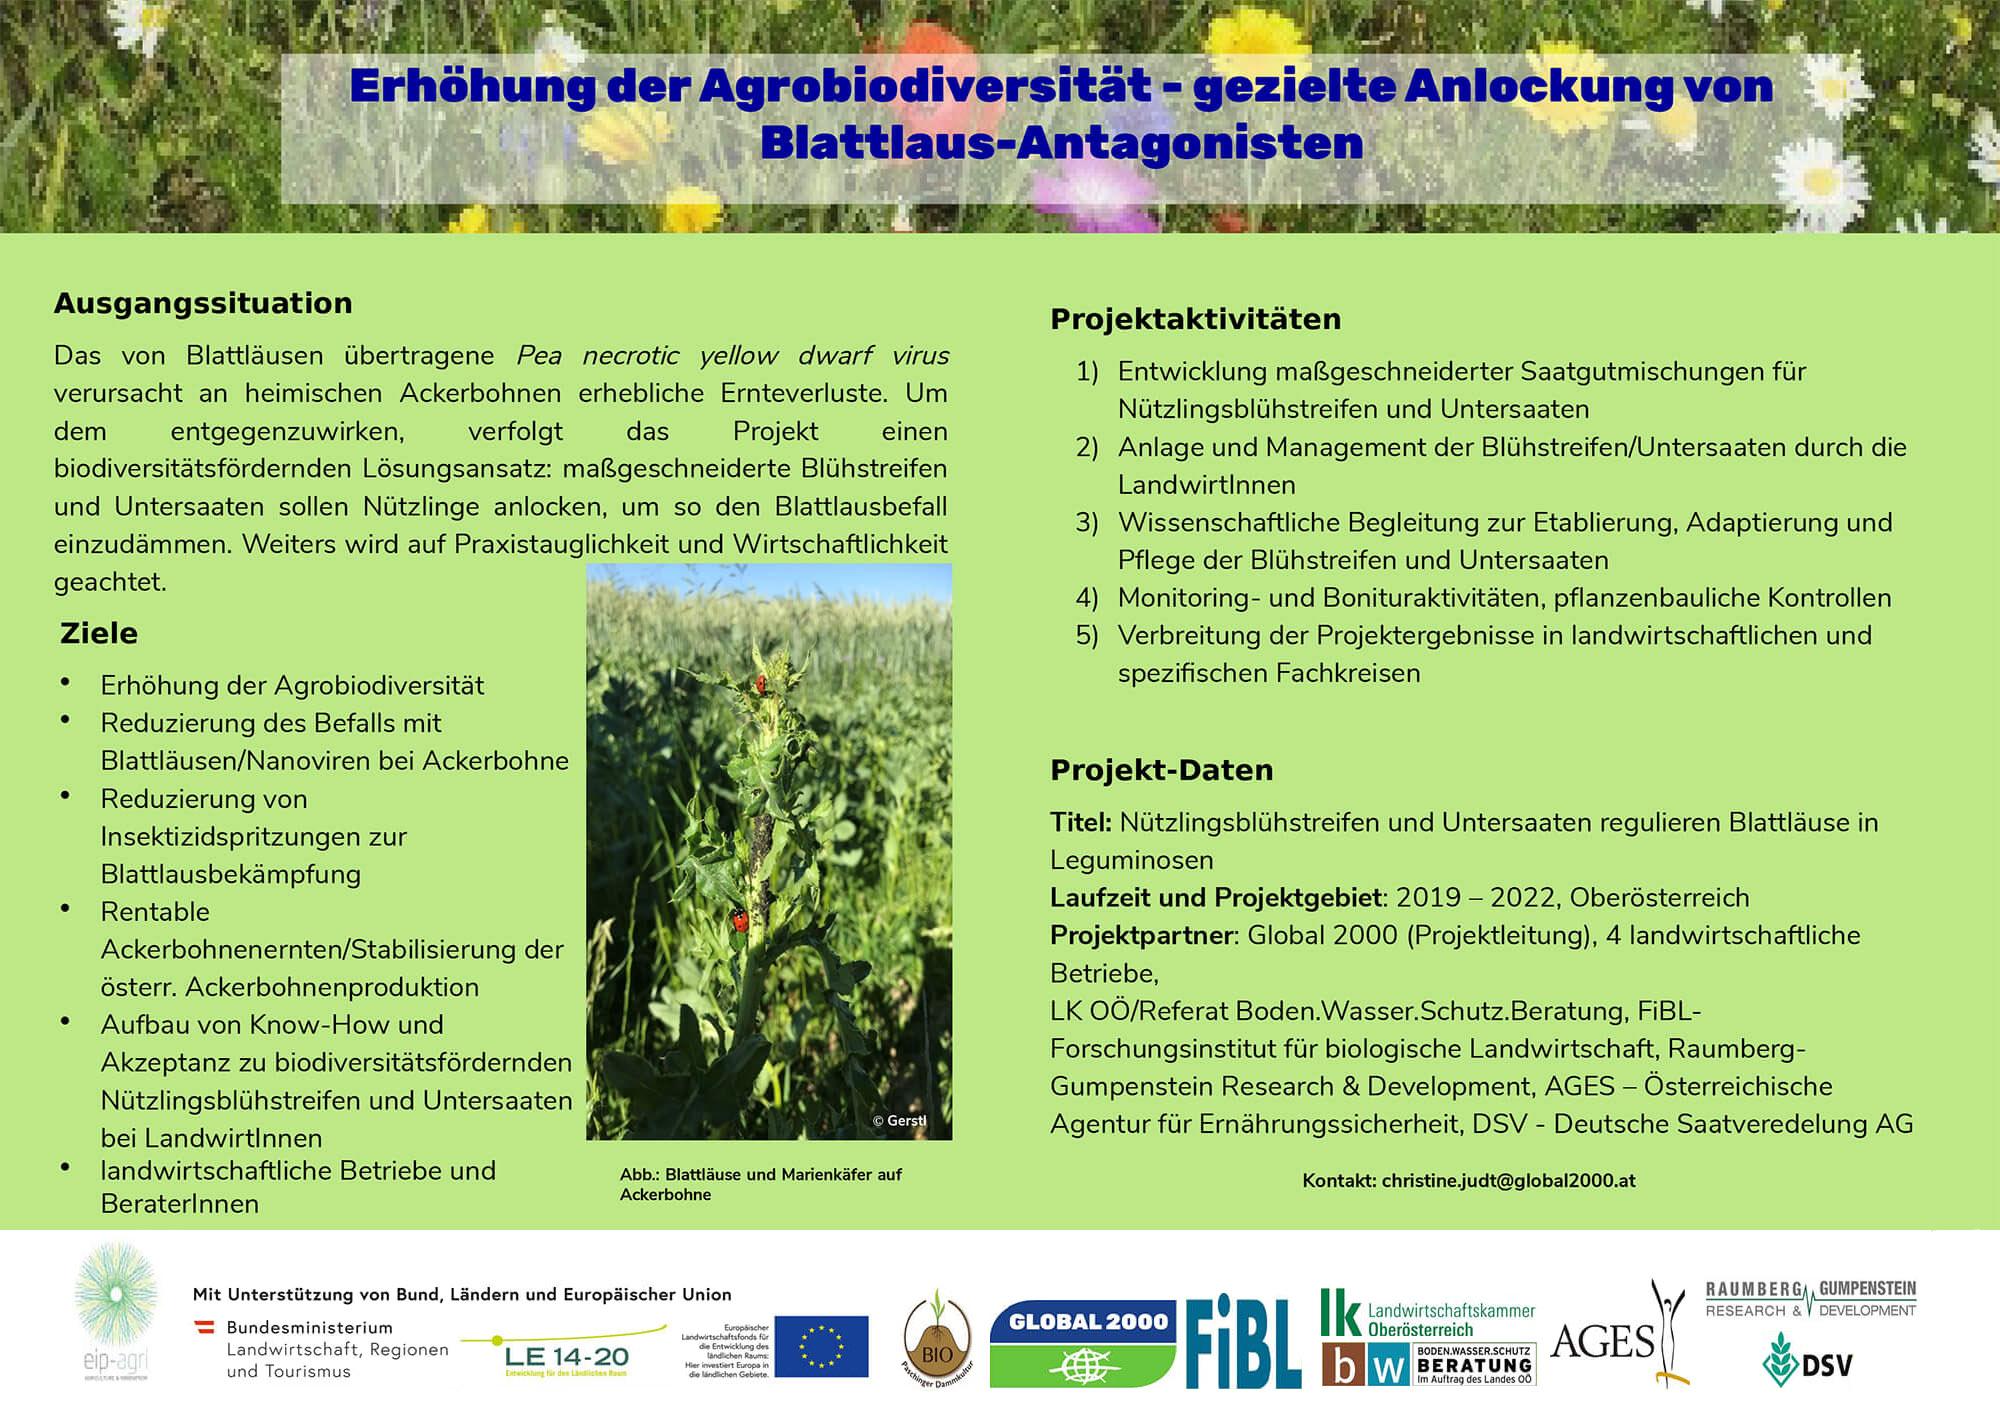 Poster: GLOBAL 2000 Blattlaus-Projekt